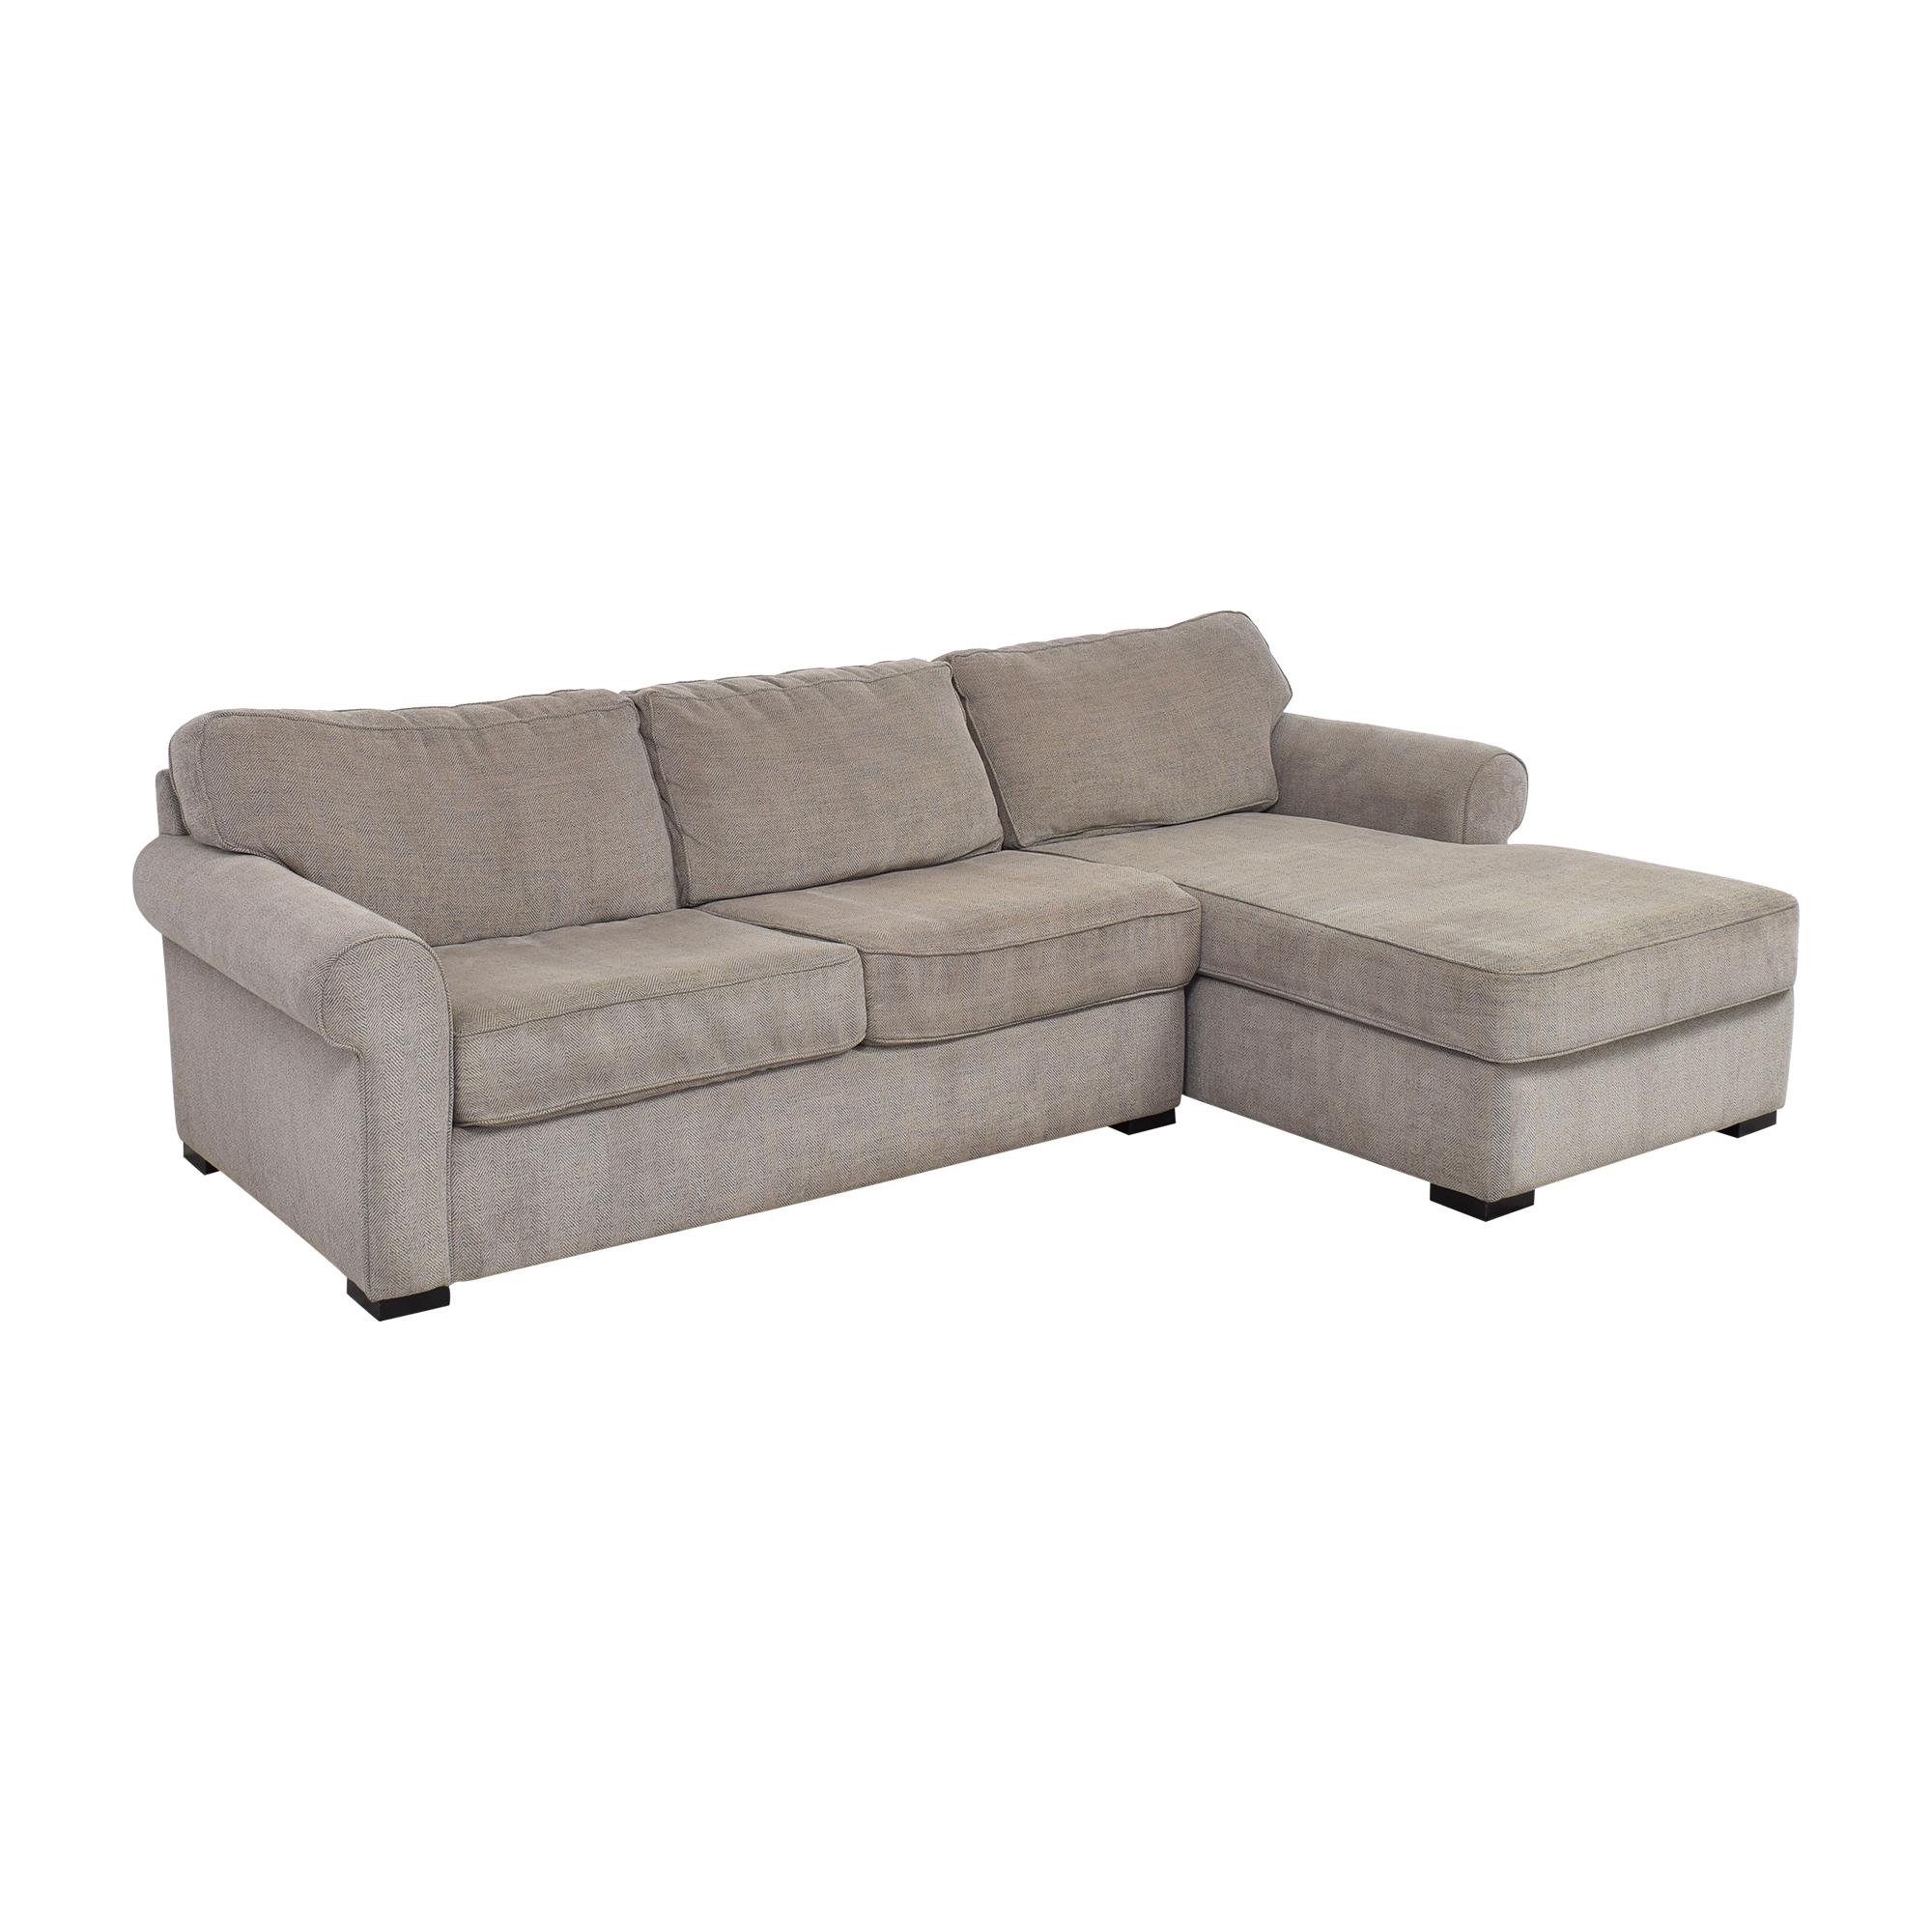 Raymour & Flanigan Raymour & Flanigan Kipling Two Piece Sectional Sofa second hand